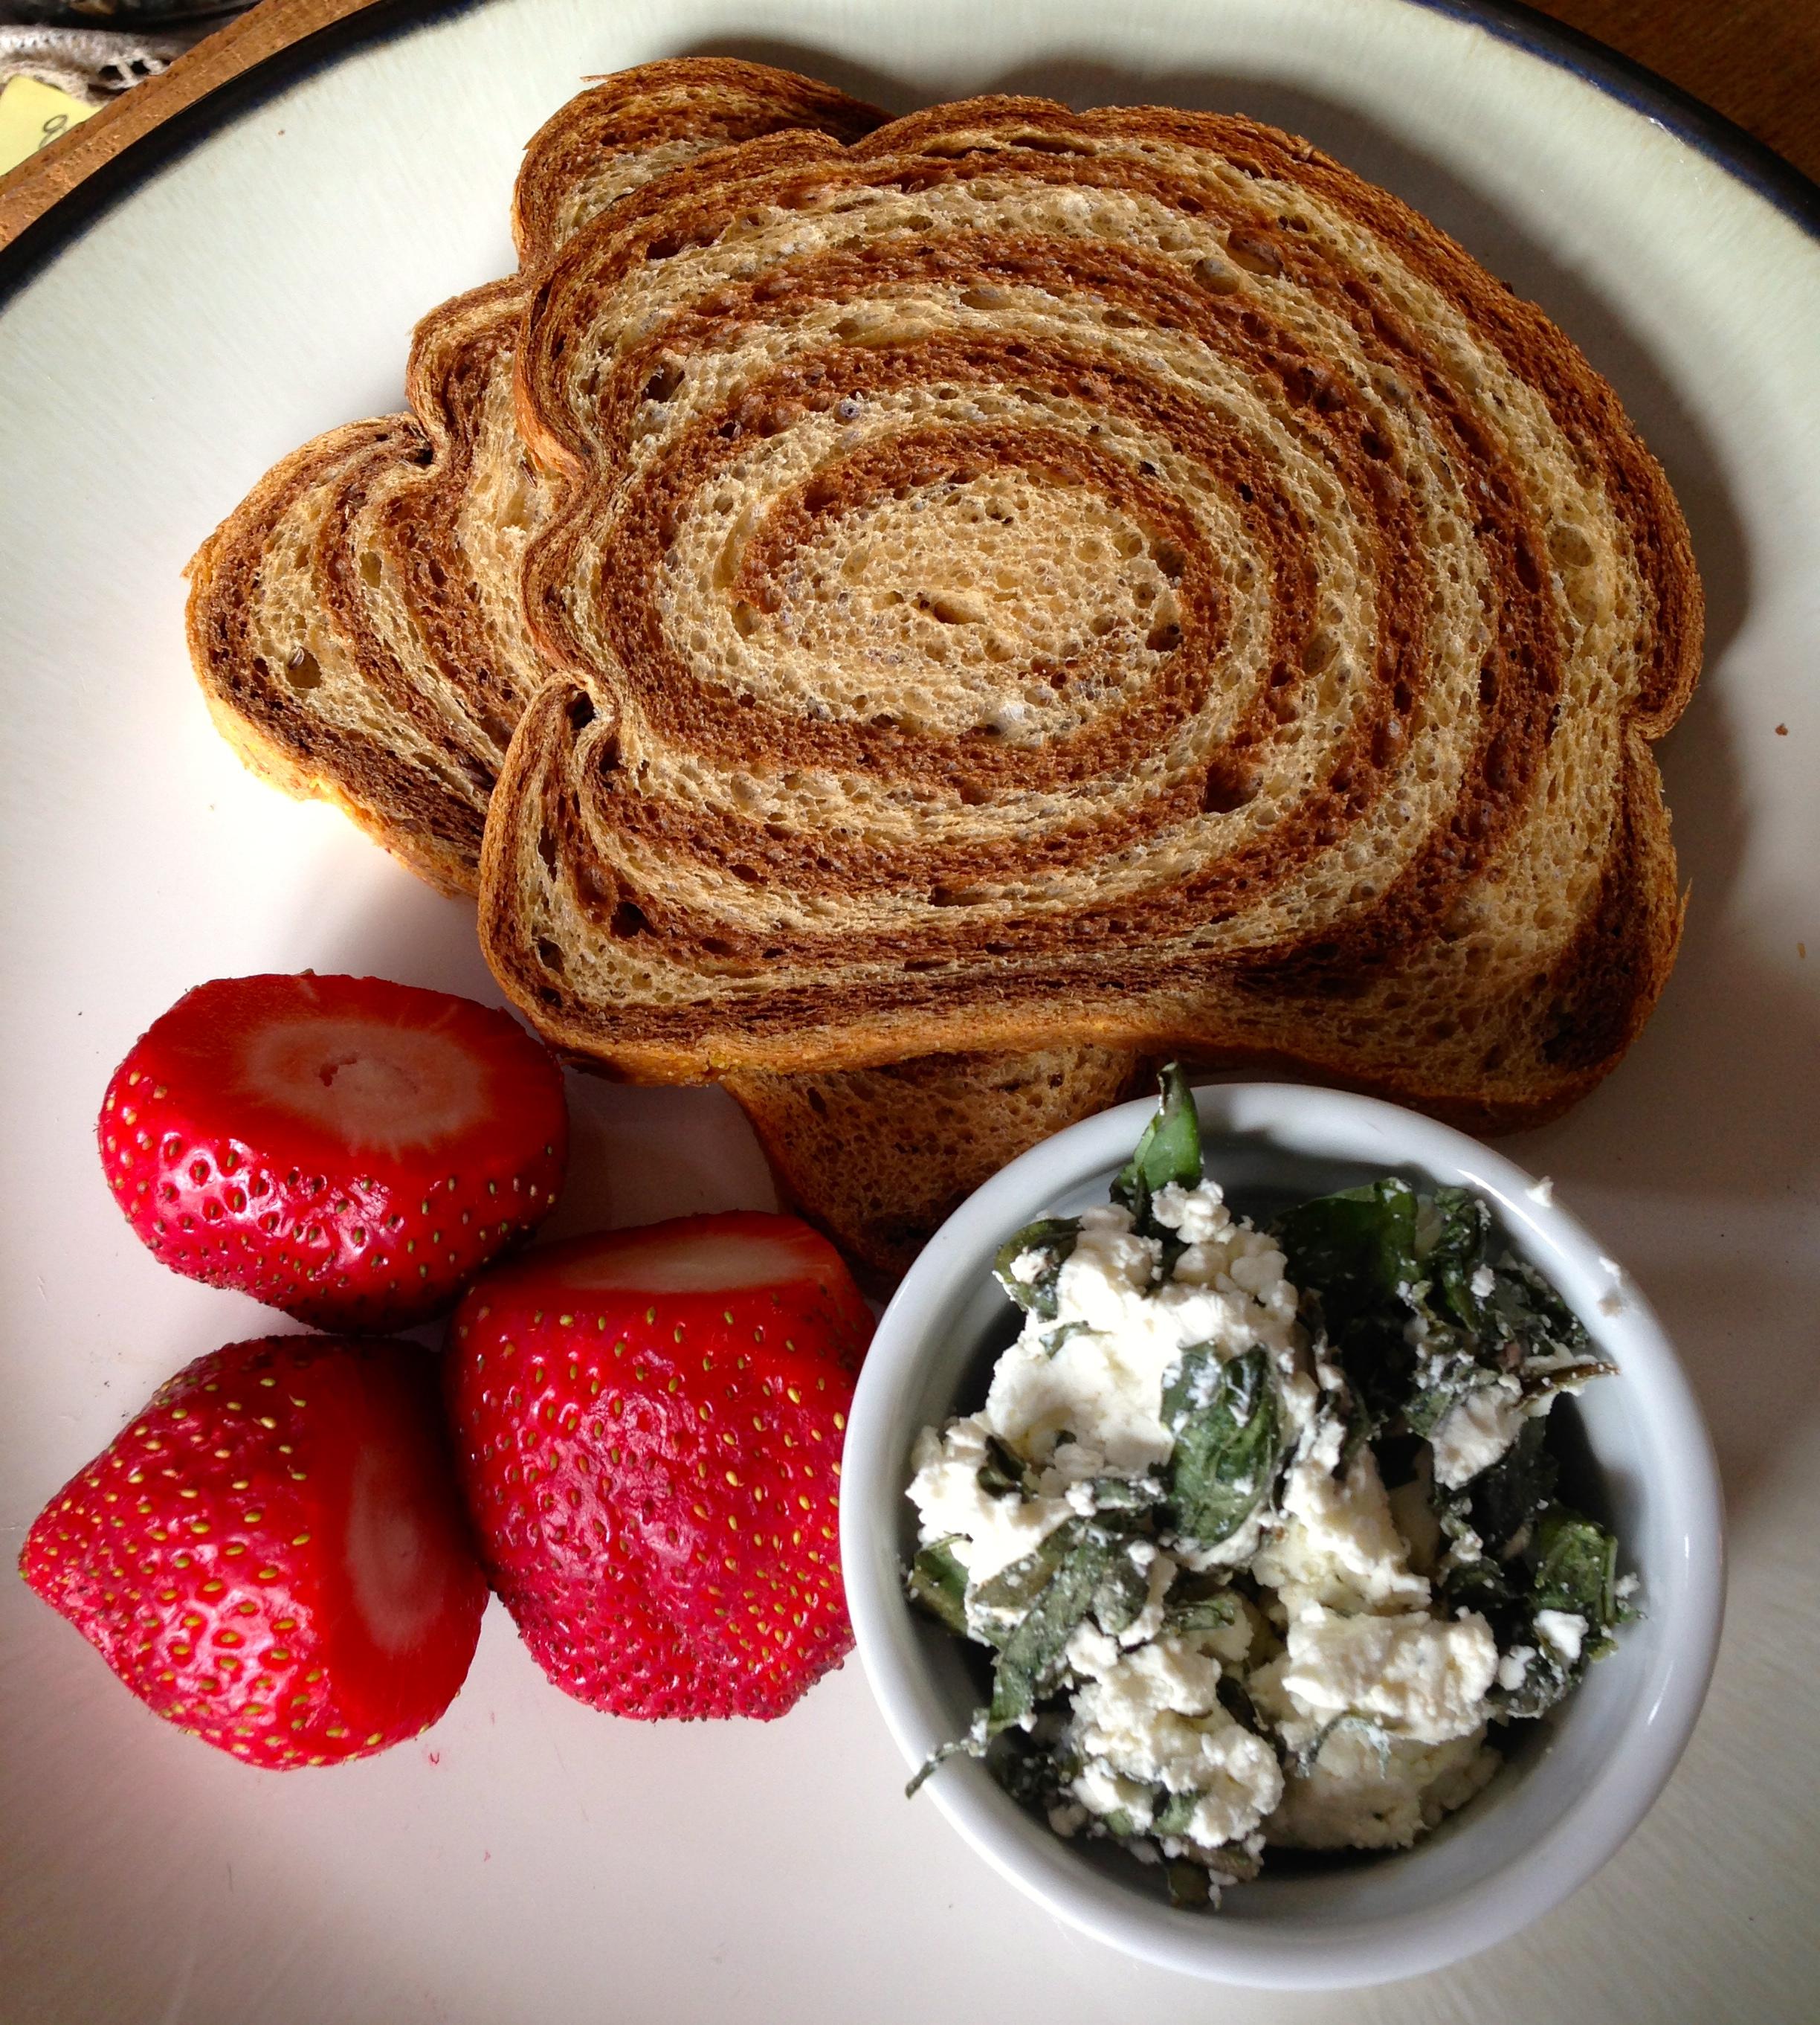 Strawberry Basil Goat Cheese Panini with Balsamic Glaze | Zest it Up